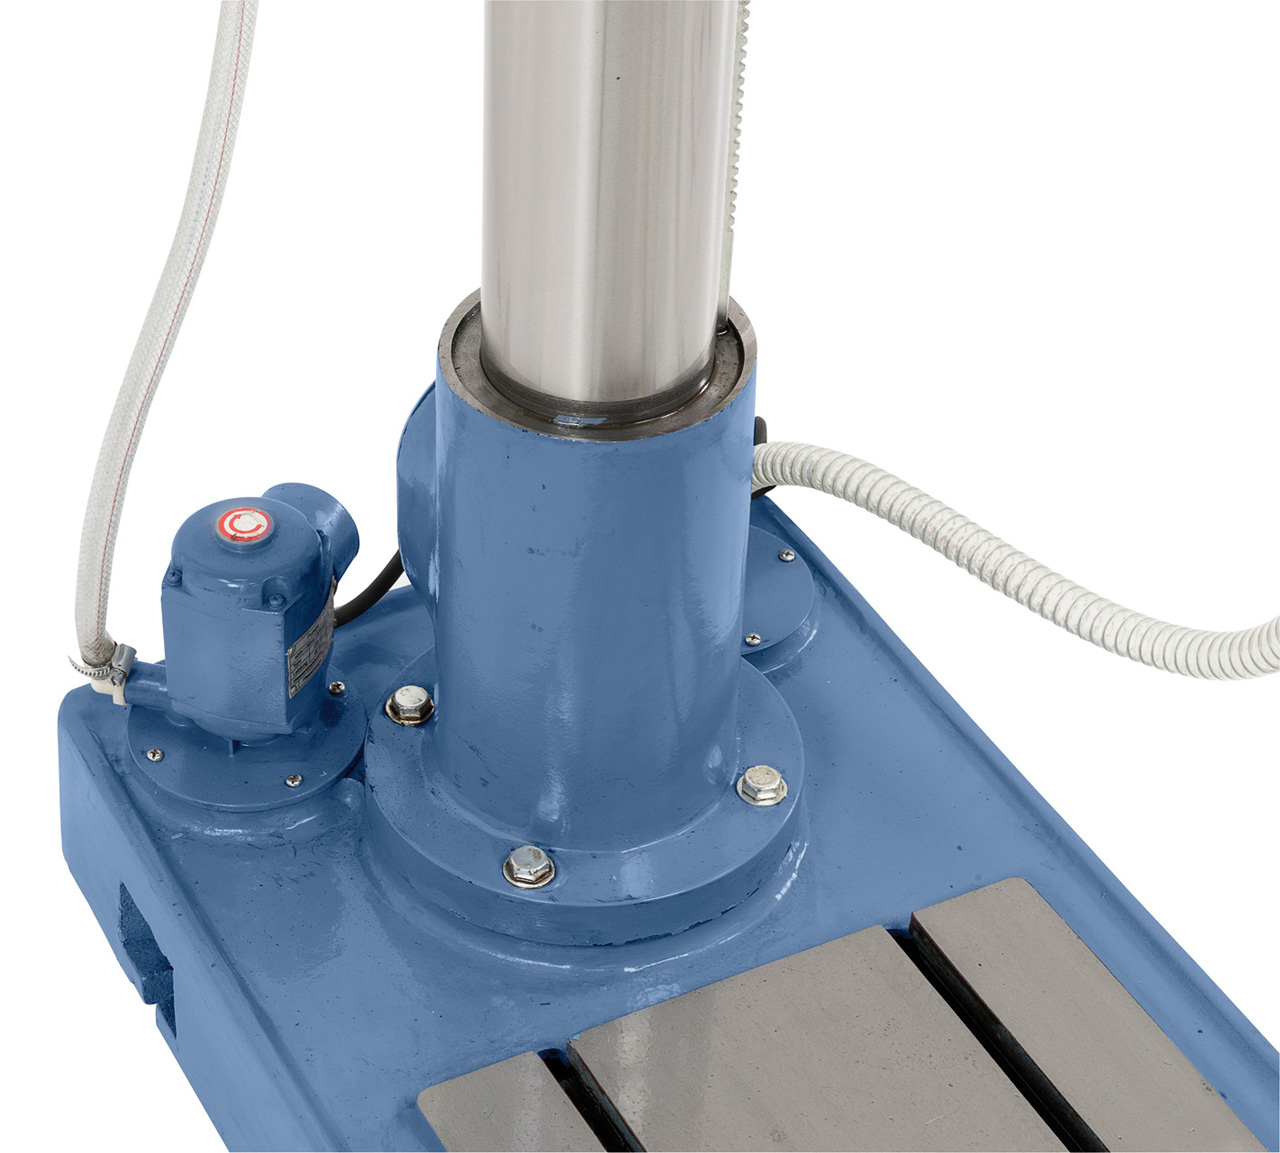 Serienmäßig mit integrierter Kühlmittelpumpe in der Bodenplatte.